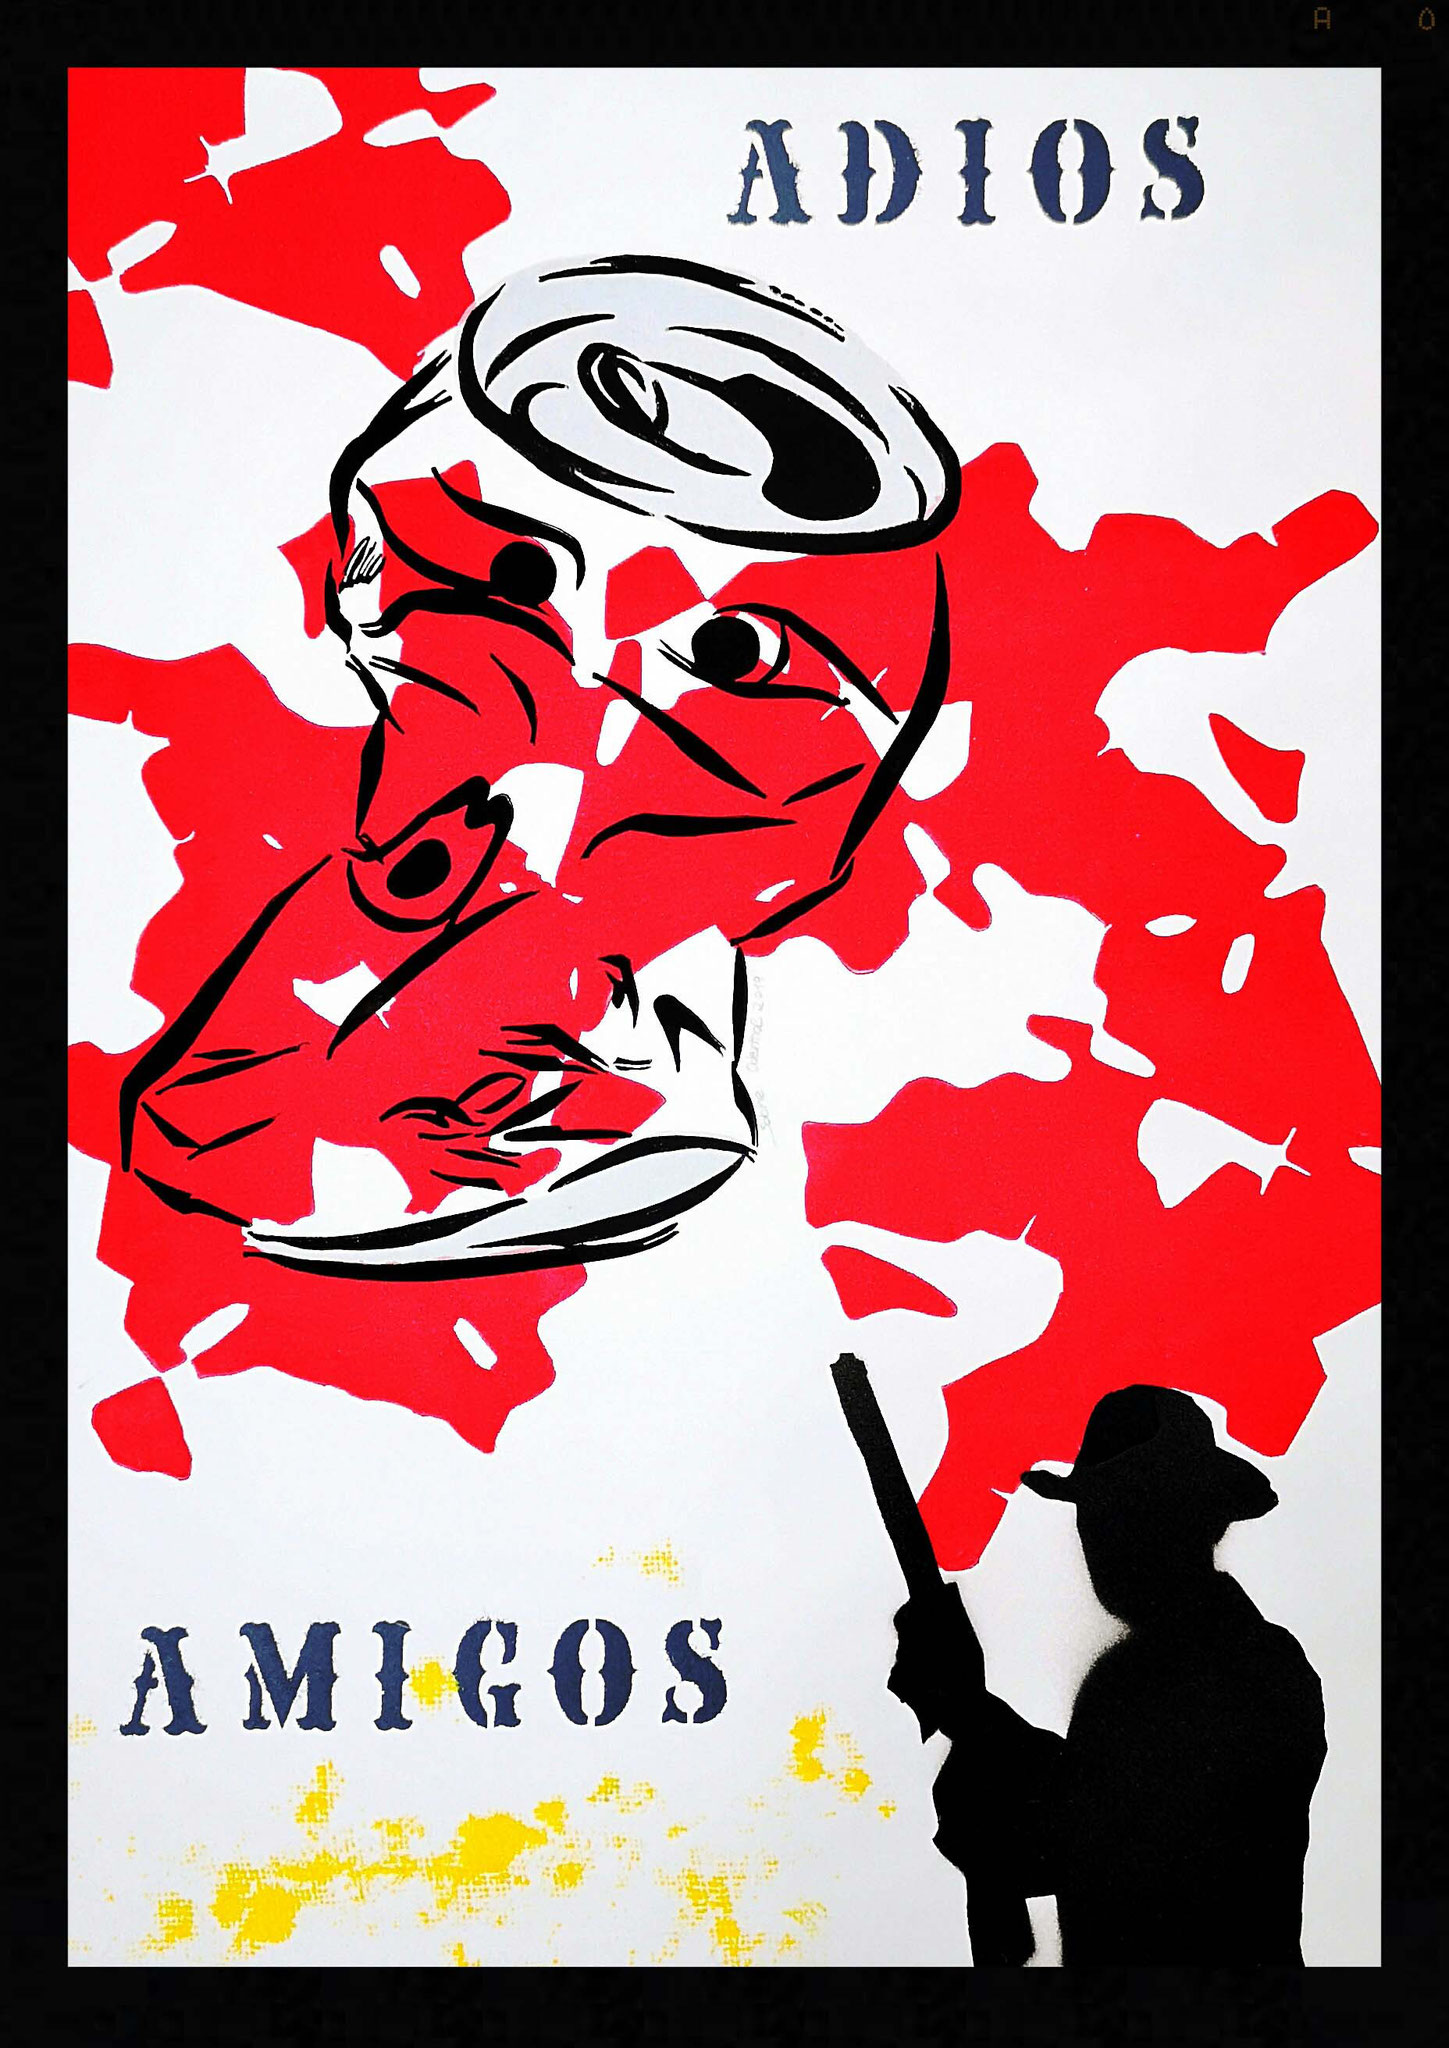 """Adios Amigos"" Linolschnitt & Stencil 2019, Unikat, 50 x 70 cm, Cooperation mit Malte Sonnenfeld"